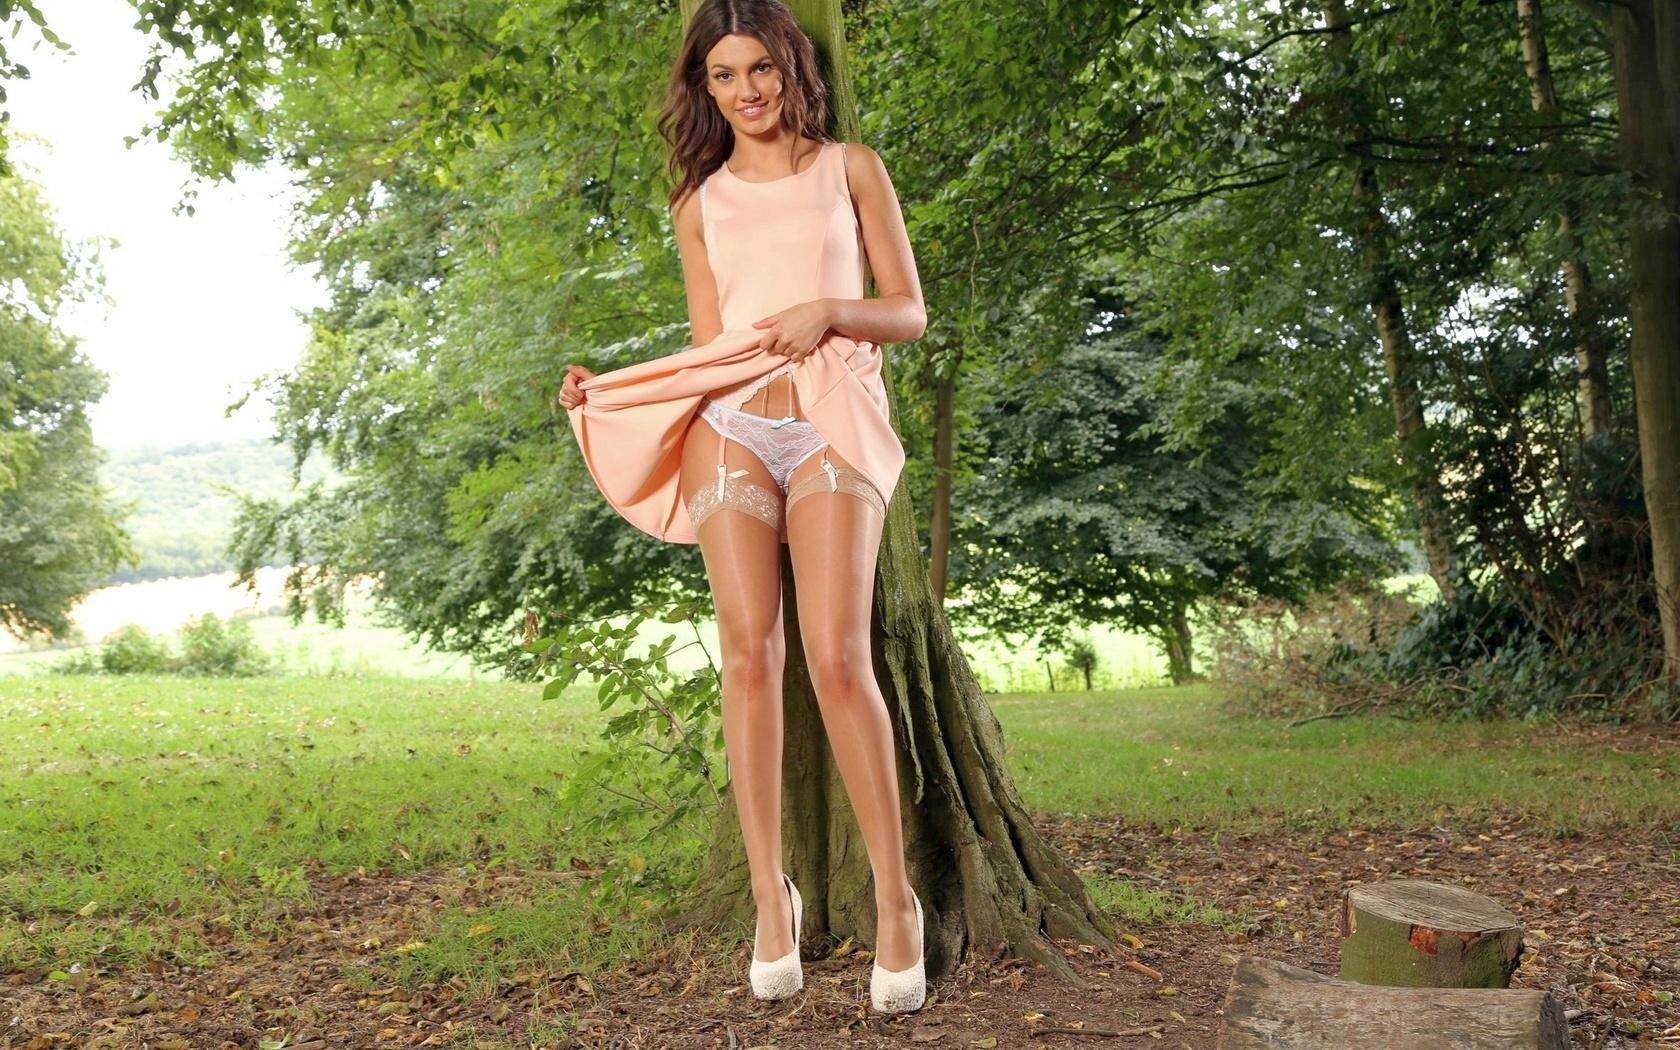 Раздвинула ножки в платье, Раздвинутые ножки девушек -фото. Девушки 24 фотография